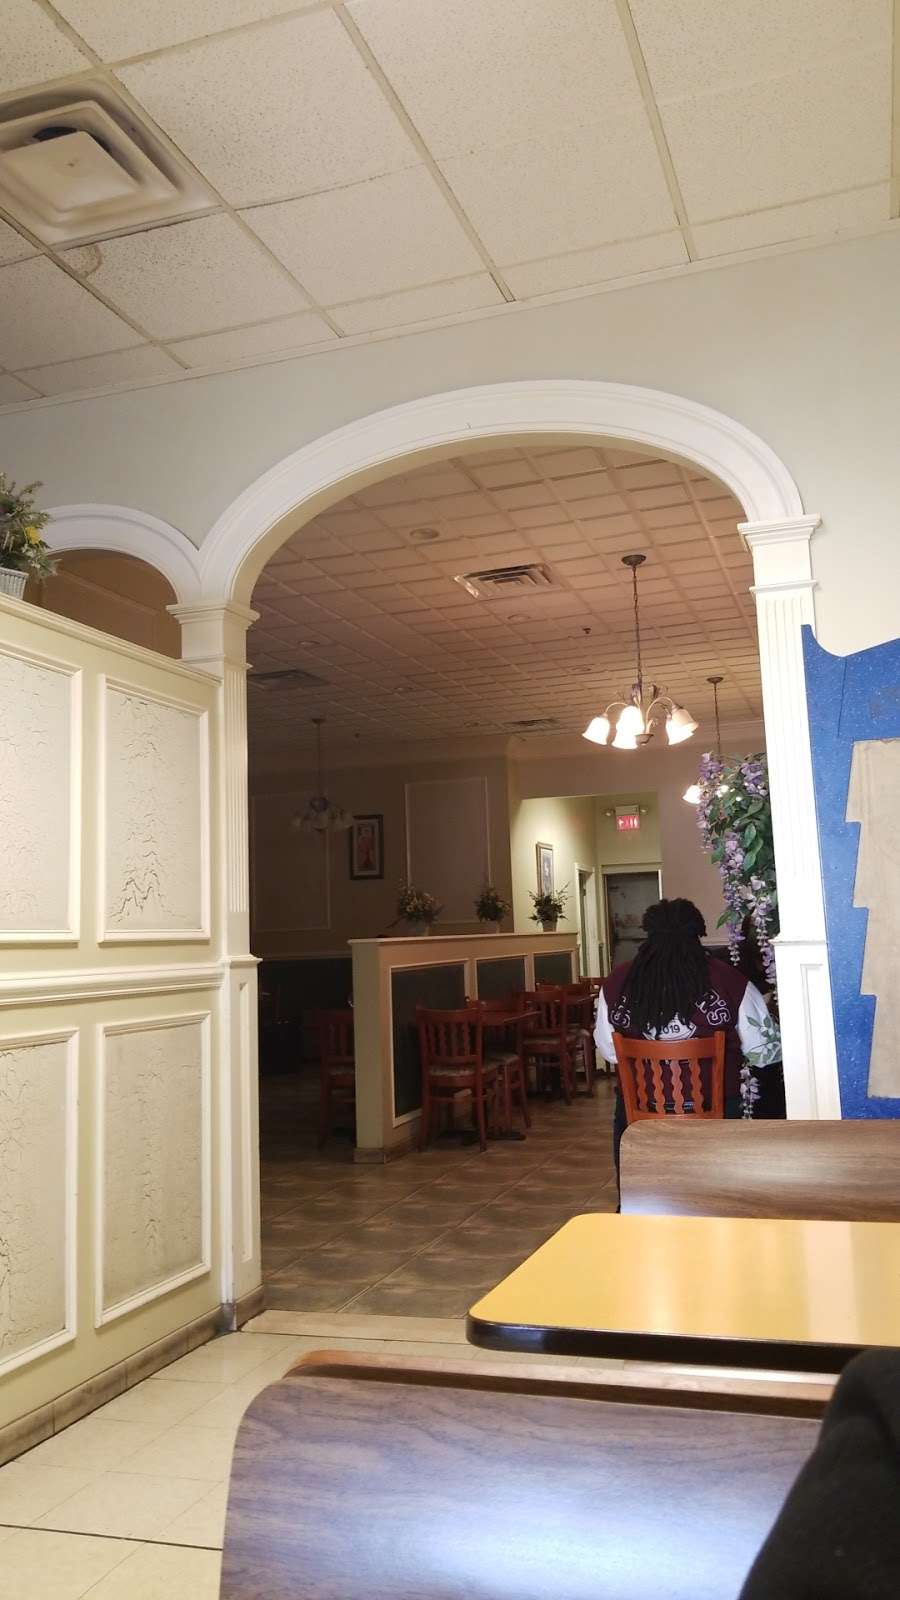 Stadium Pizza - restaurant  | Photo 2 of 10 | Address: 321 NJ-440, Jersey City, NJ 07305, USA | Phone: (201) 434-0100